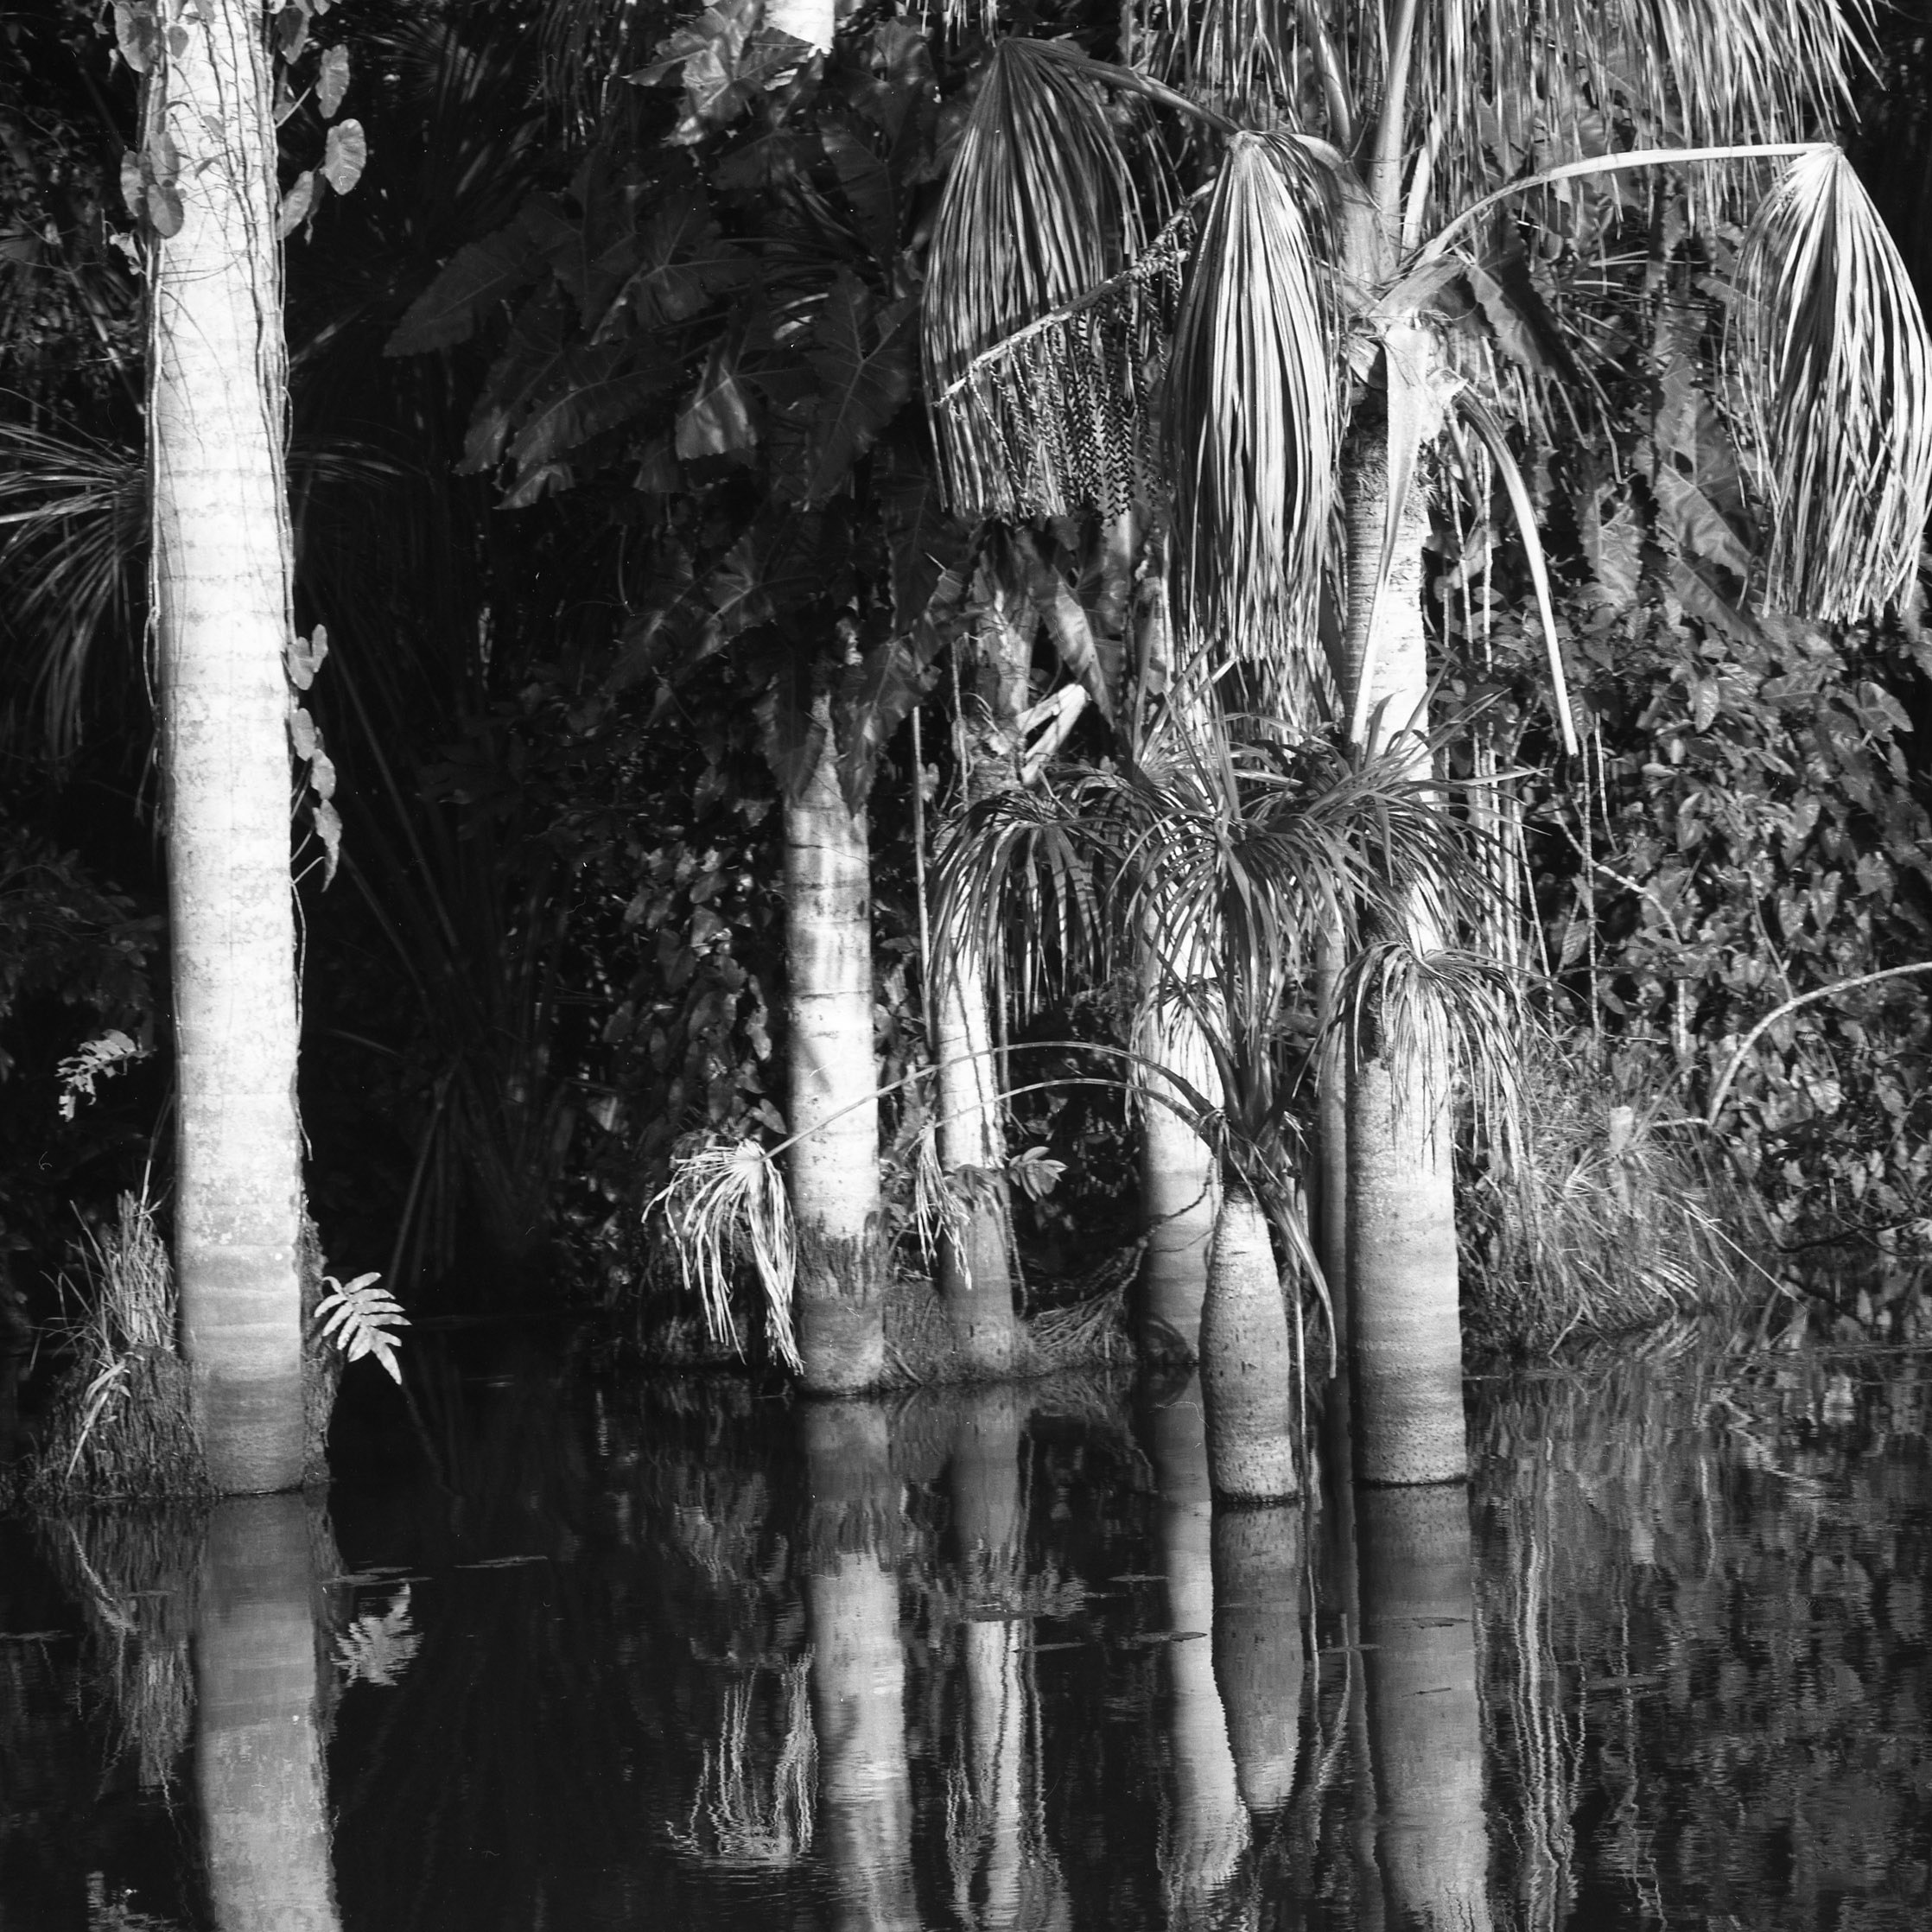 Tambopata National Reserve Sandoval Lake, Peru